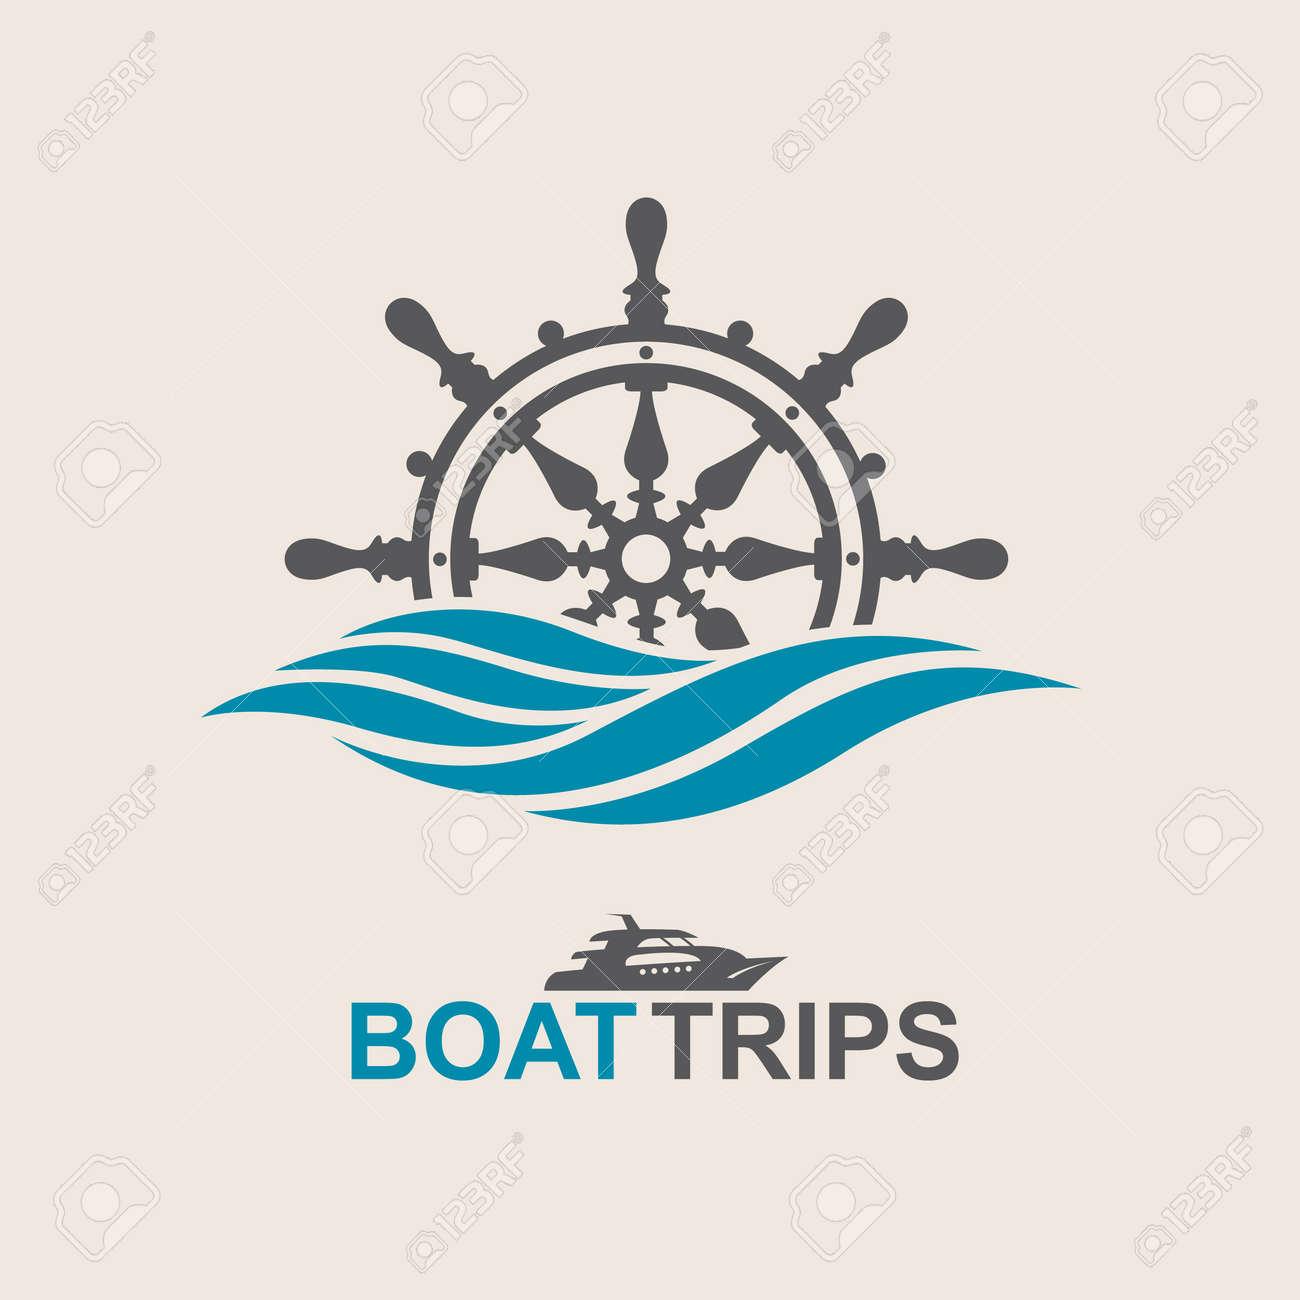 yacht helm wheel image with sea waves - 70438232